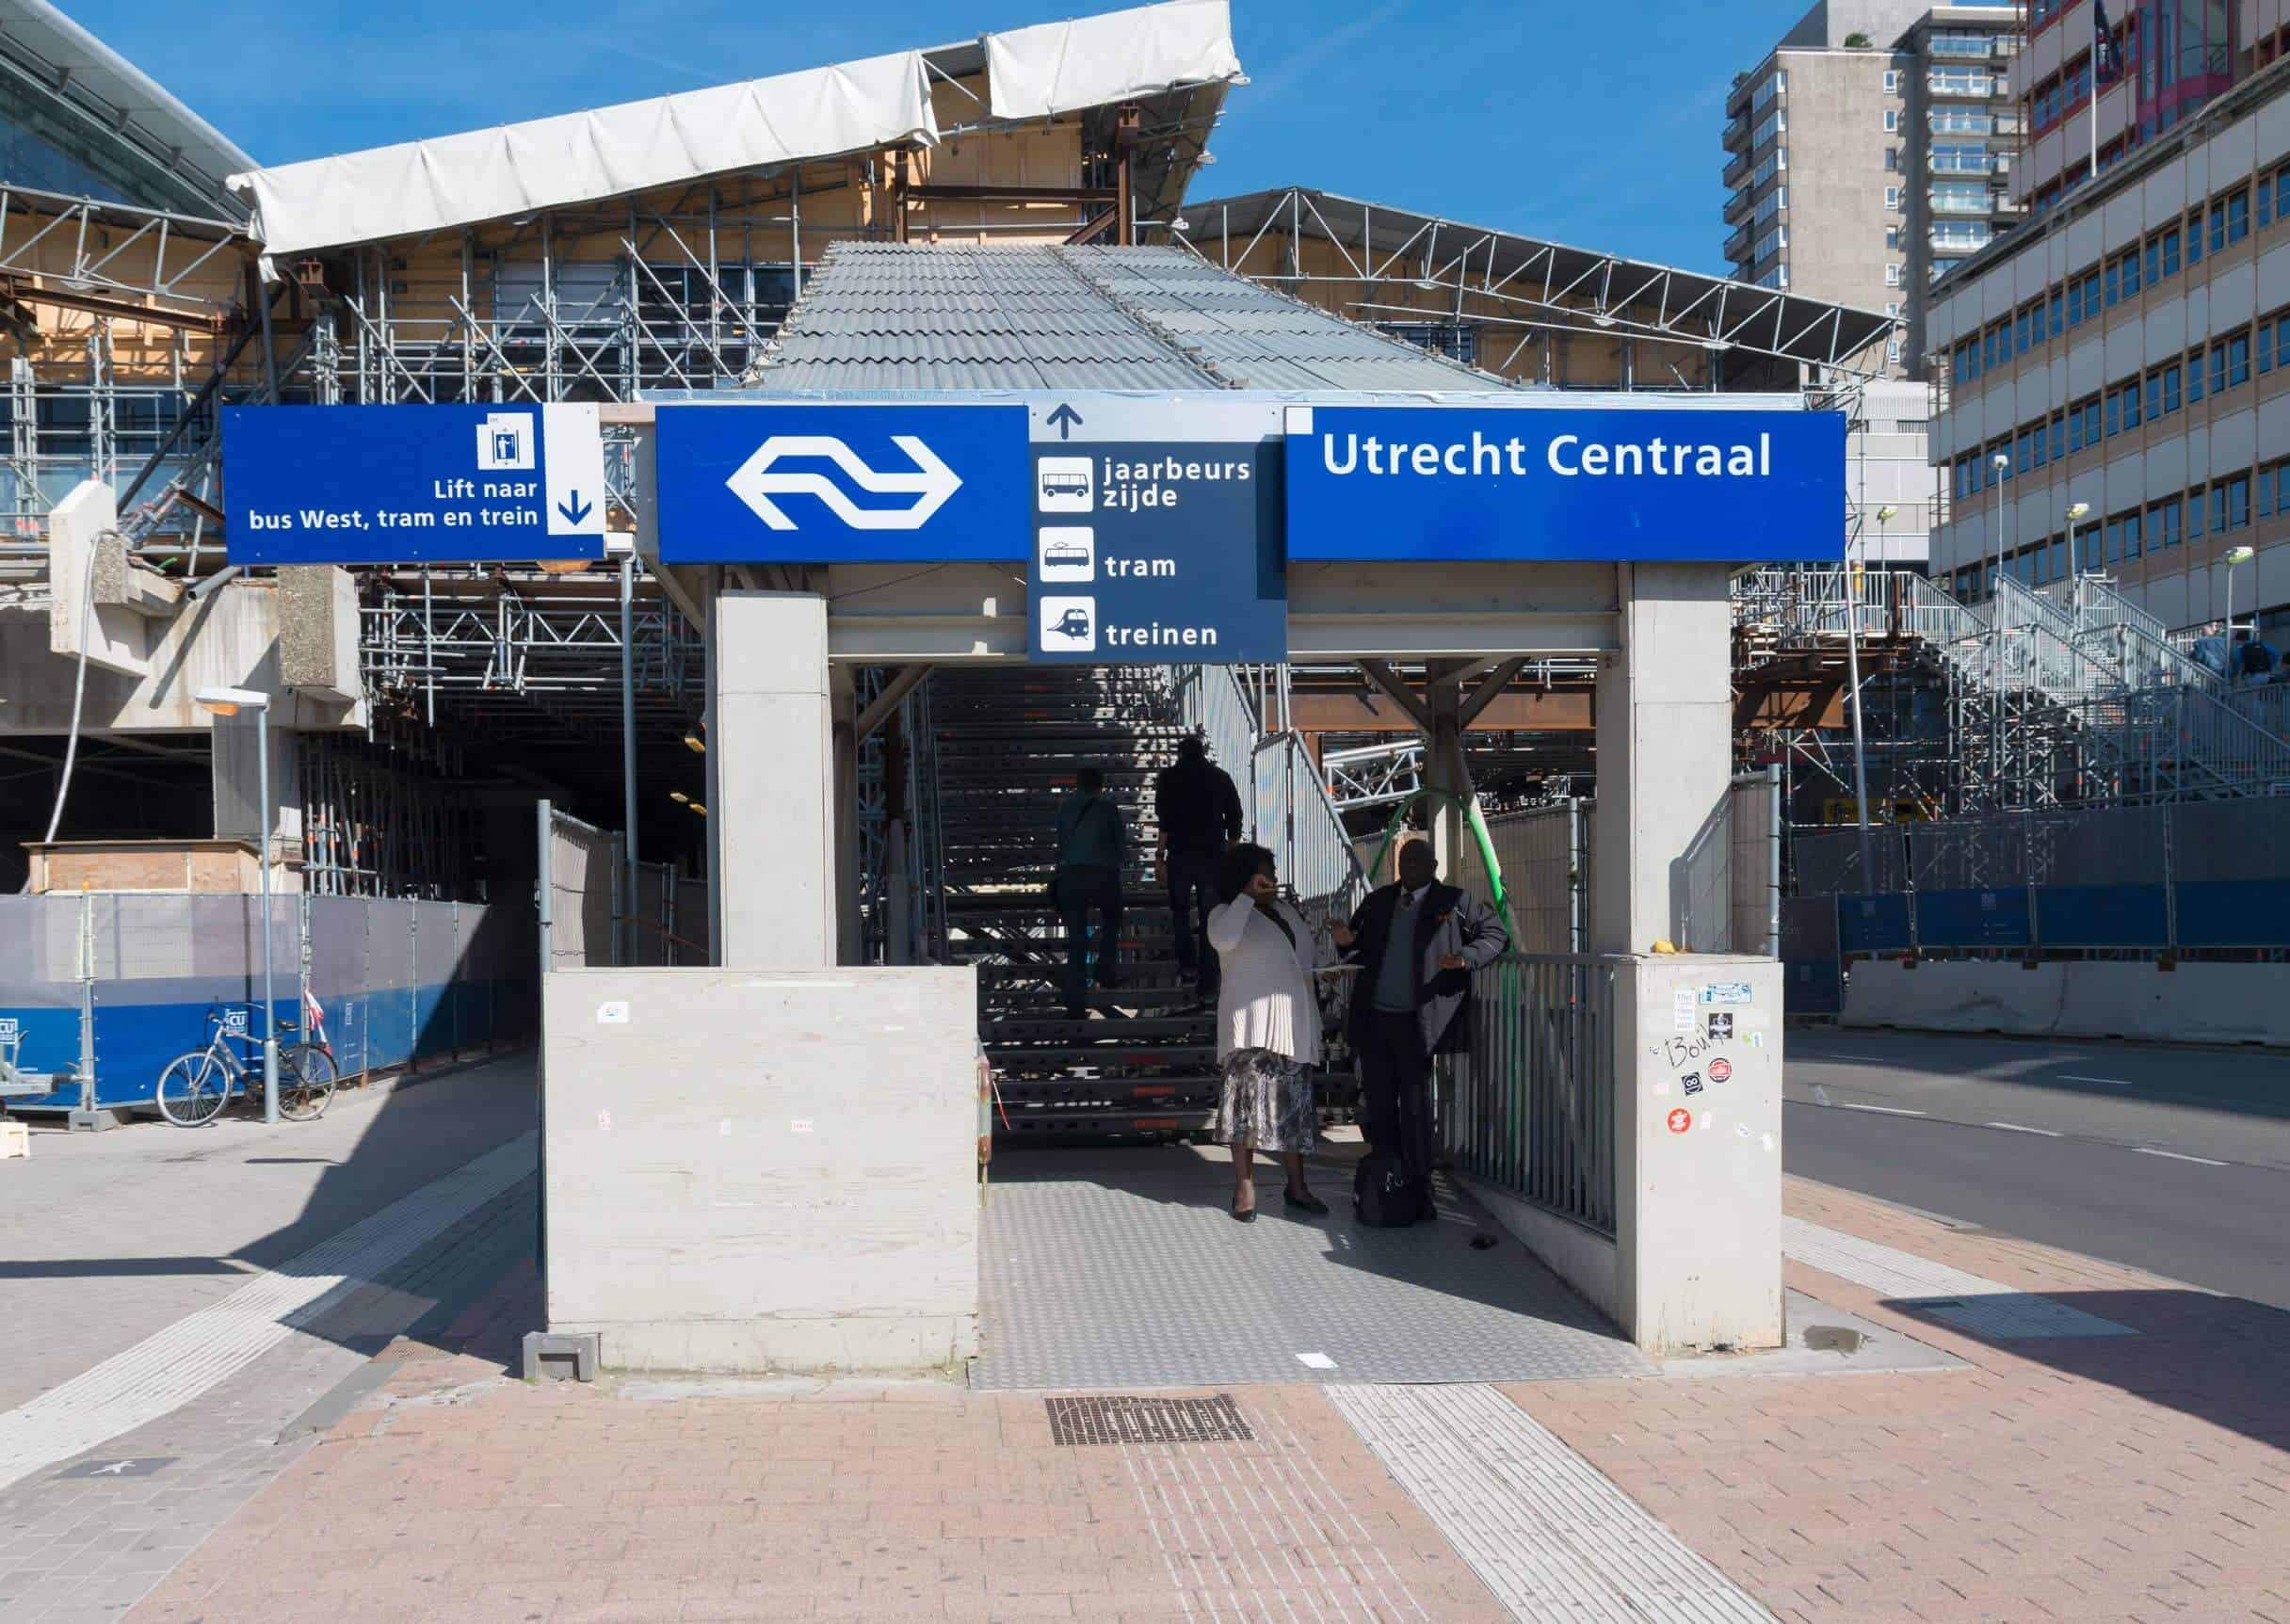 utrecht central station